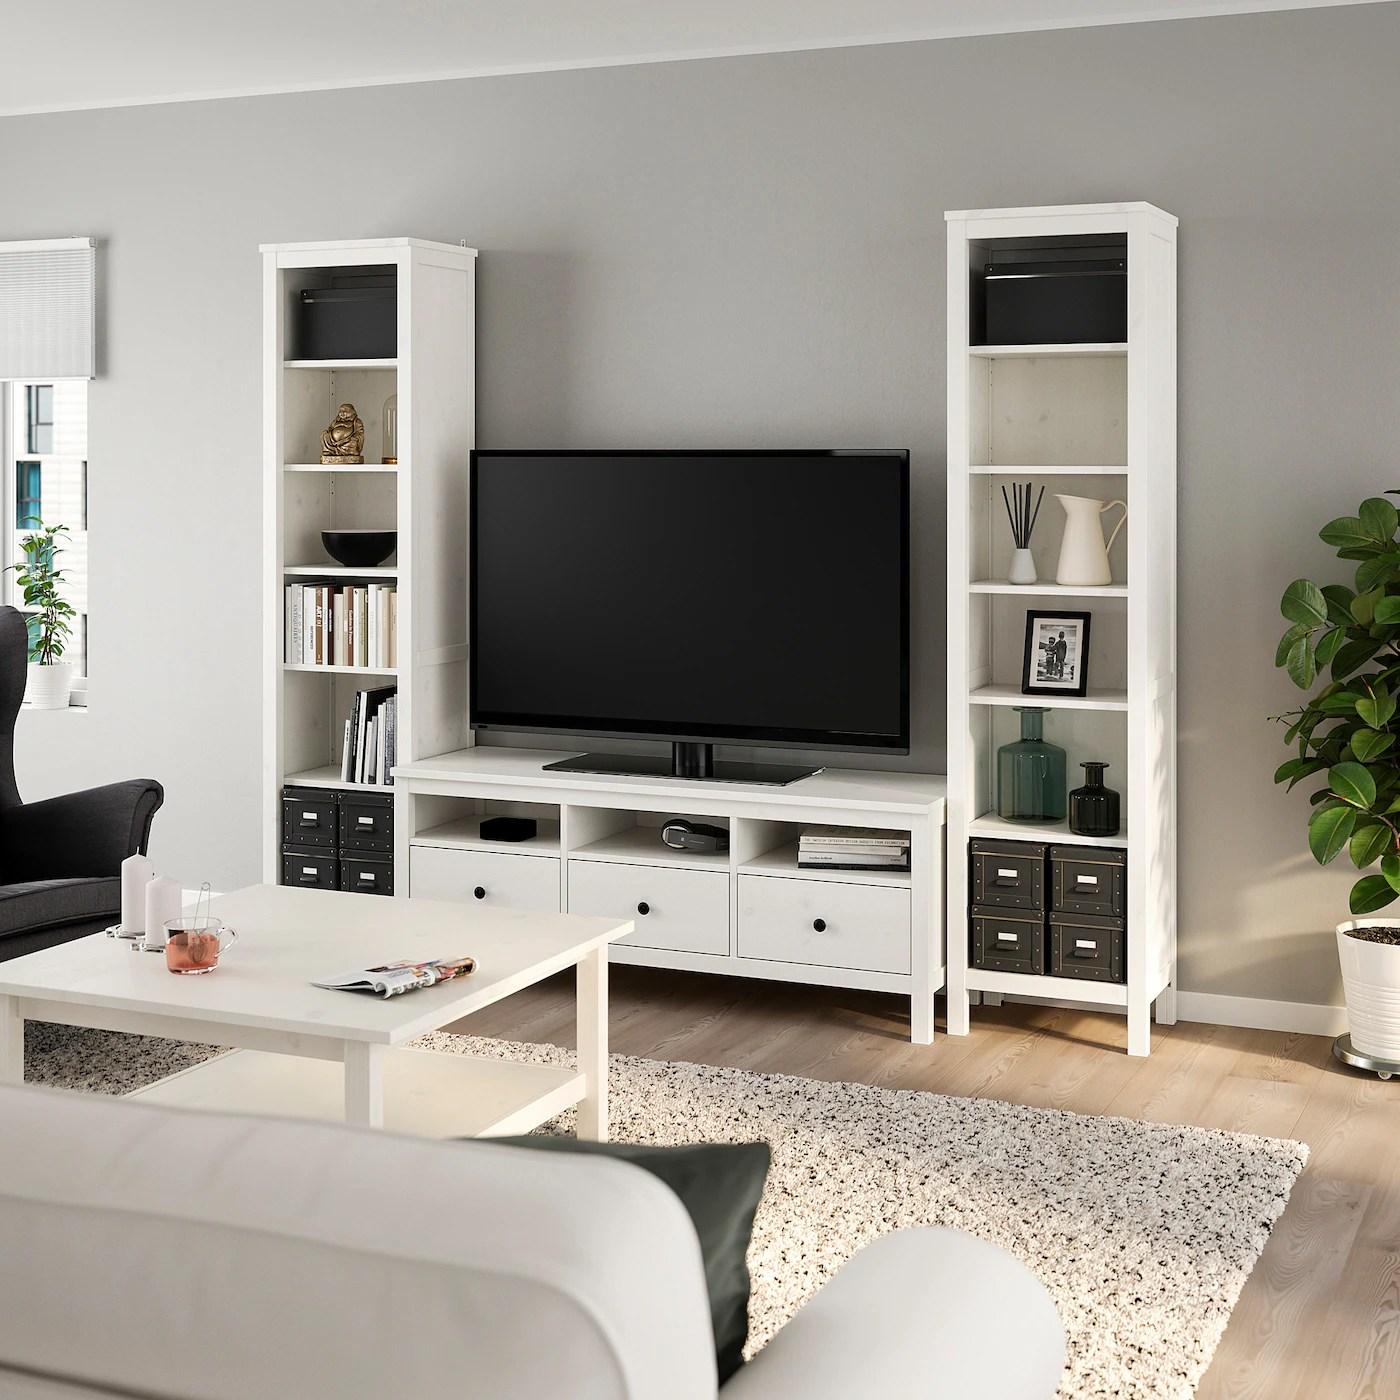 Hemnes Combinaison Meuble Tv Teinte Blanc 245x197 Cm Ikea